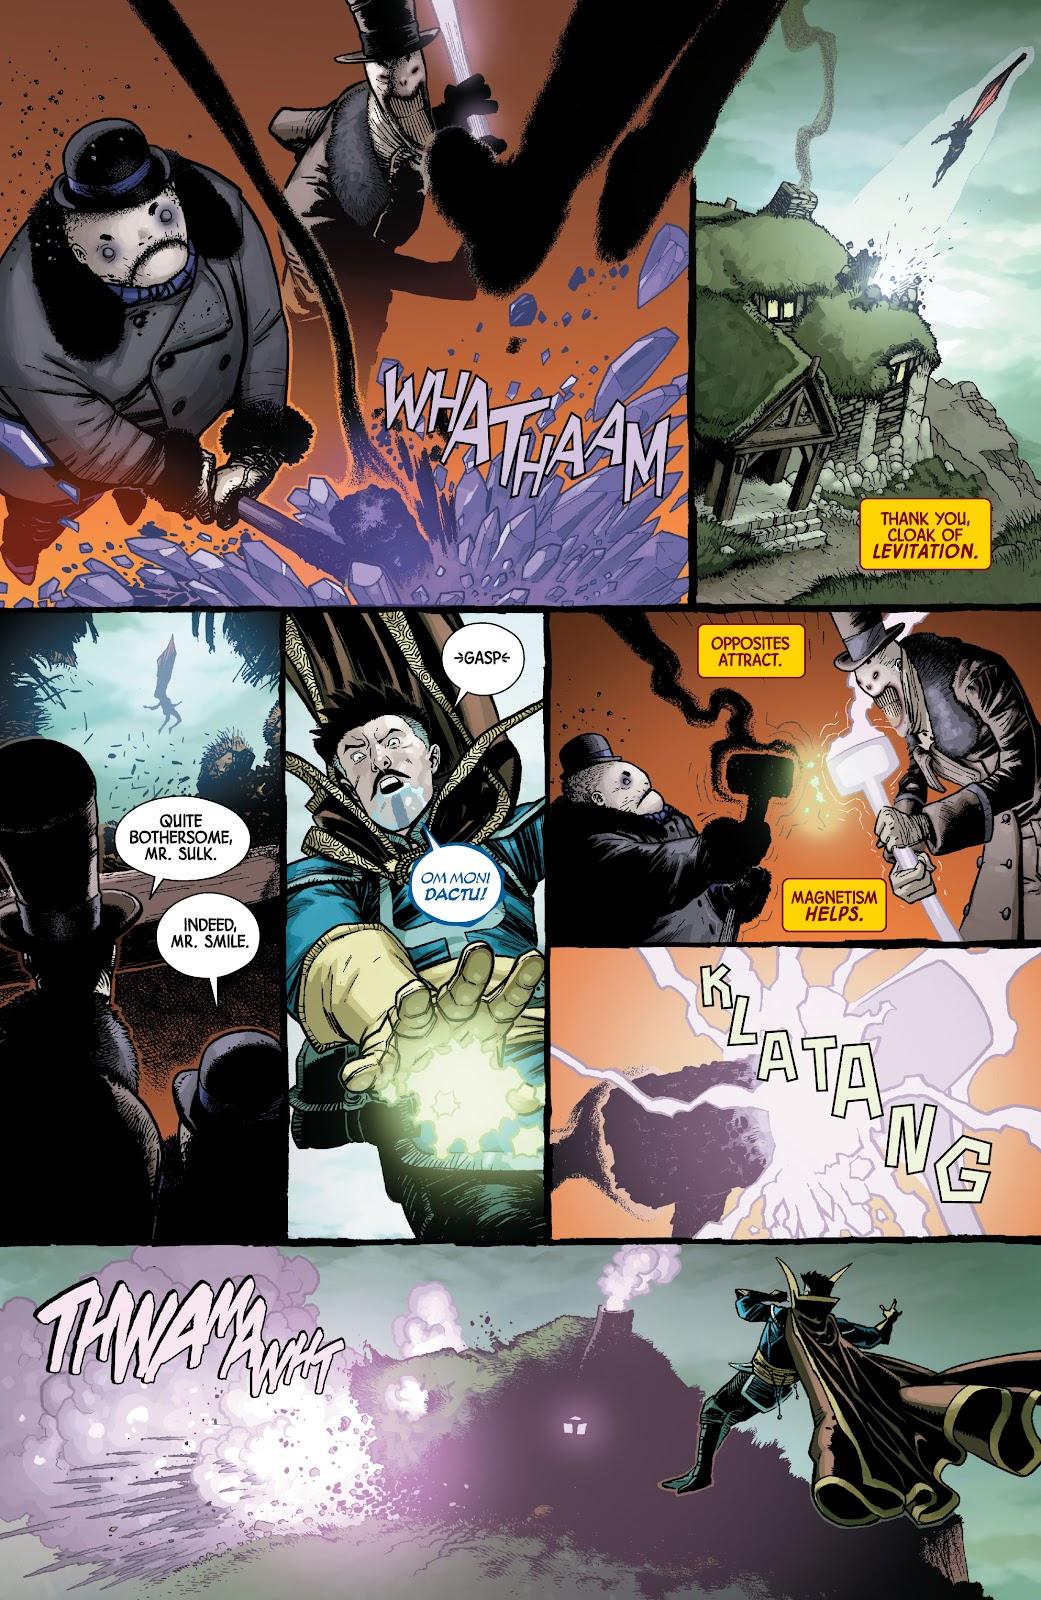 Read online Dr. Strange comic -  Issue #5 - 6